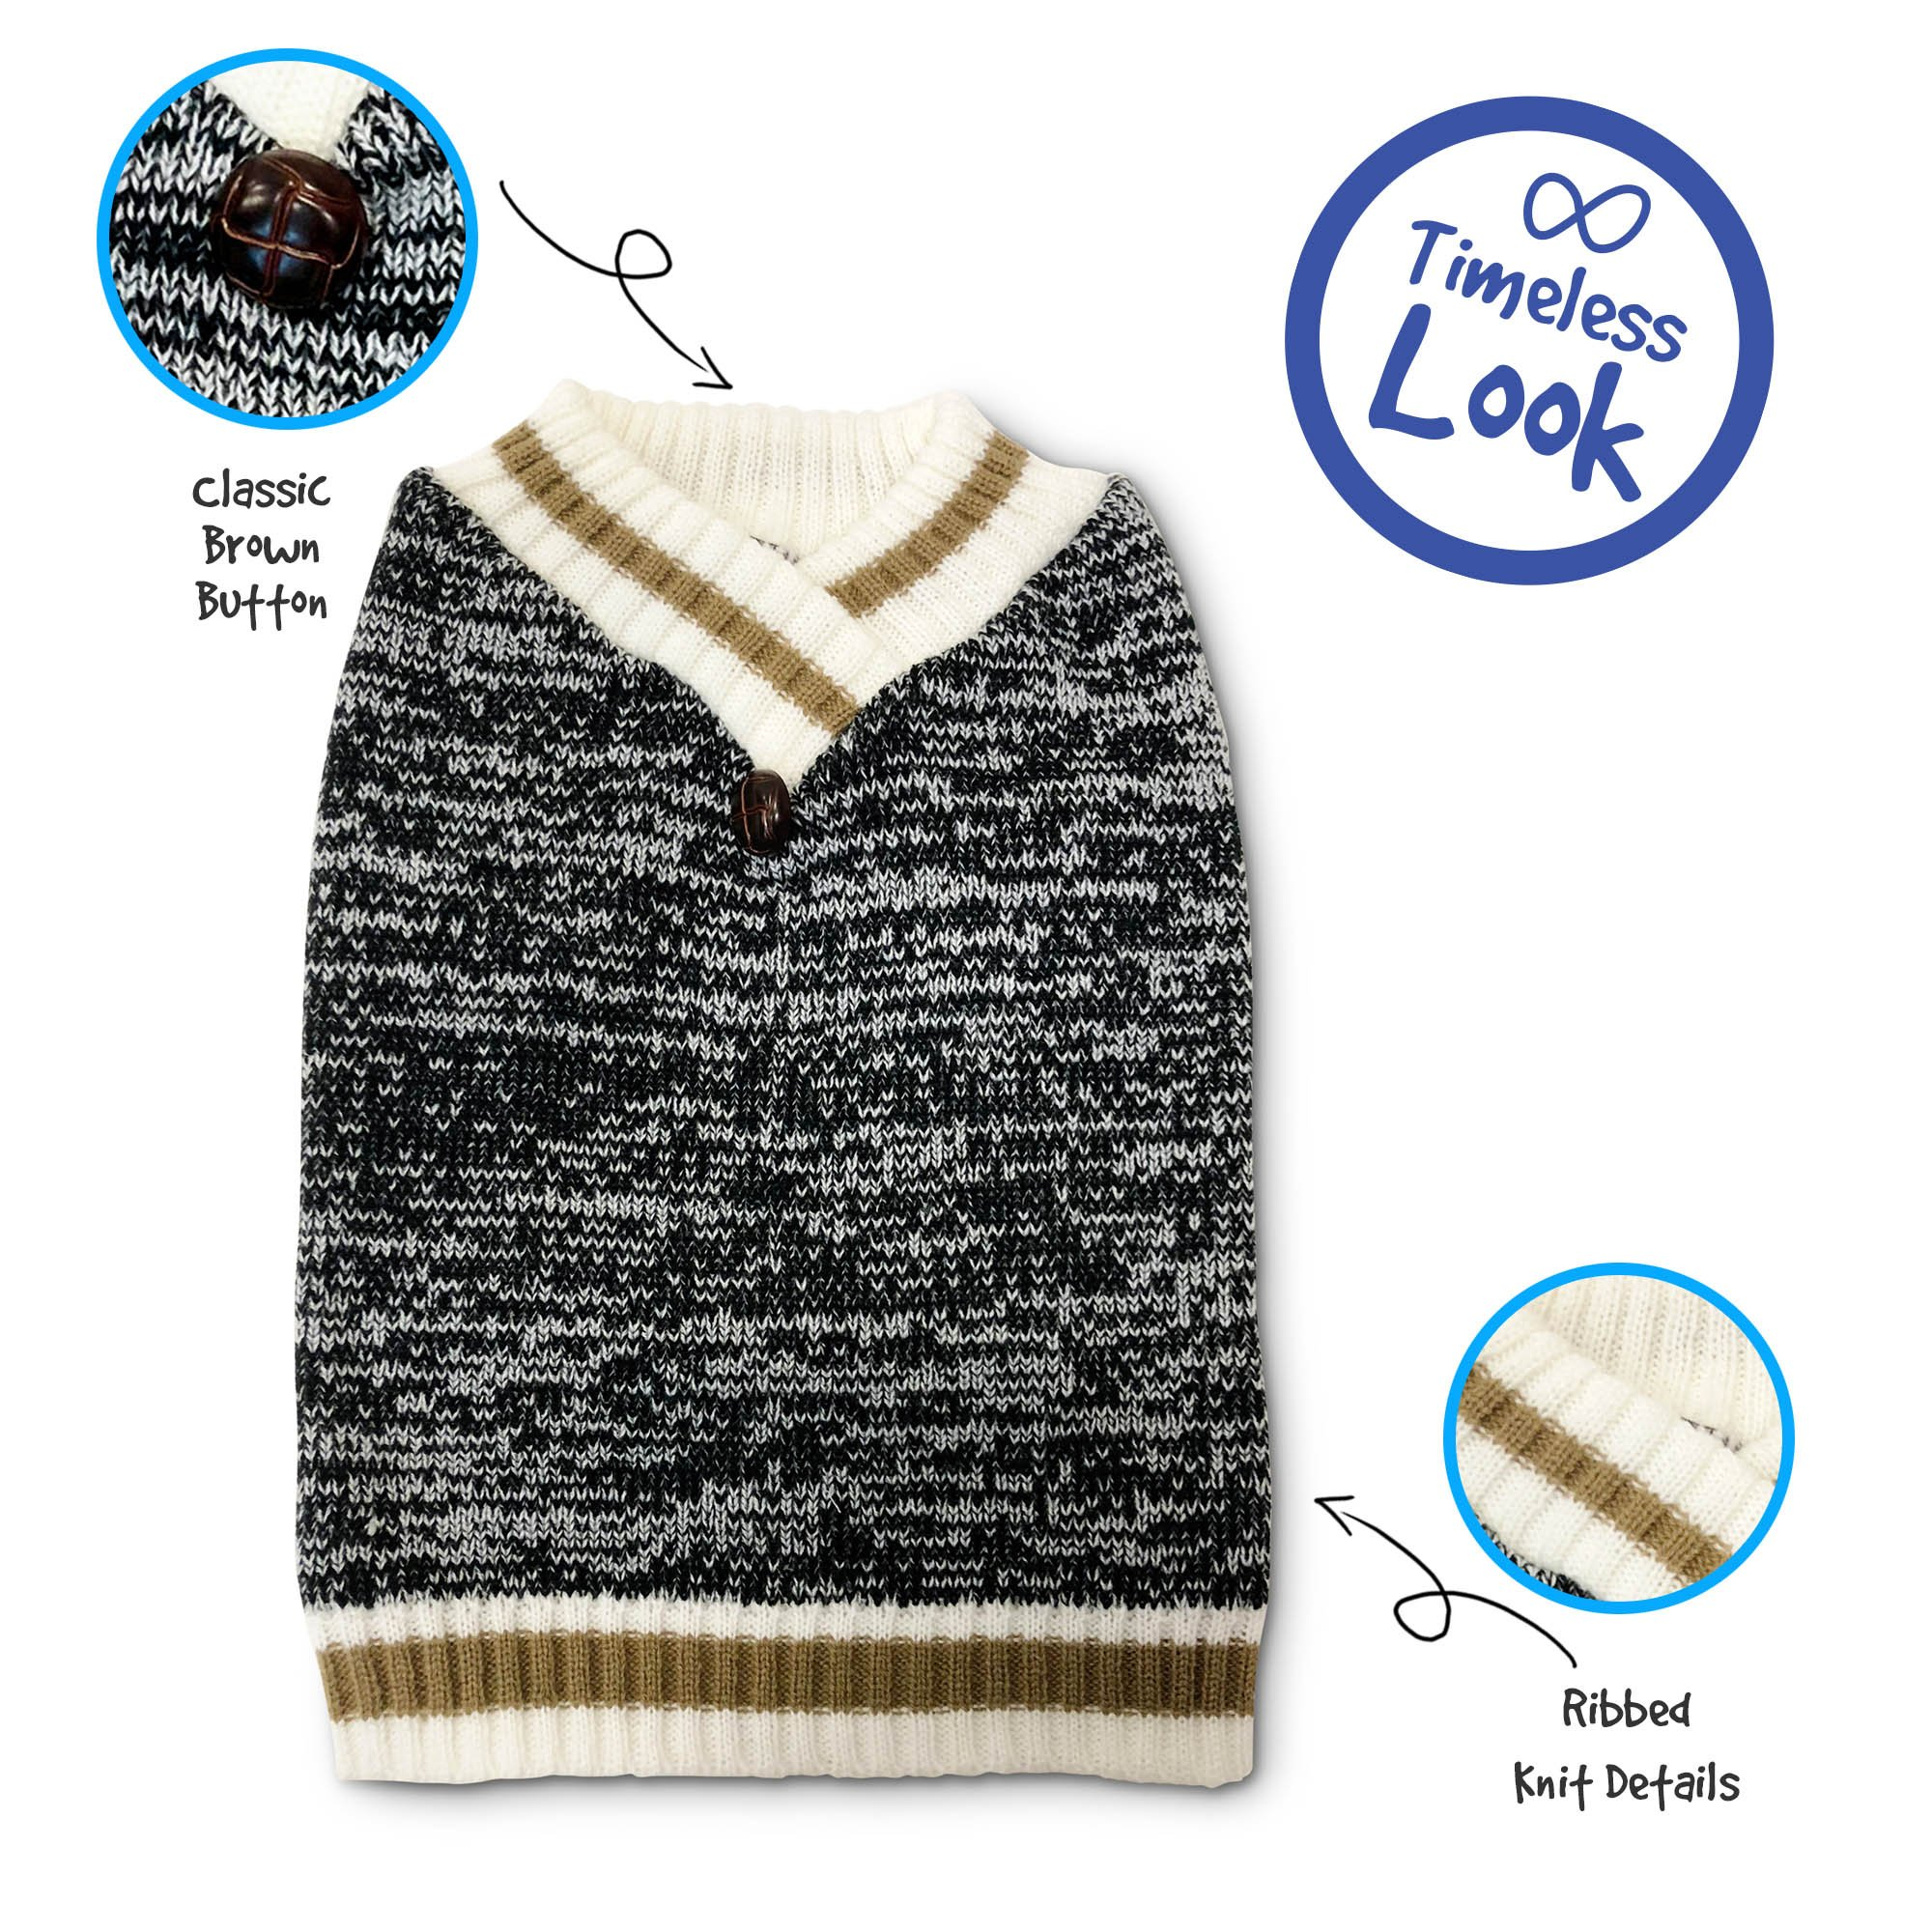 Pet Craft Supply 8971 V-nk Knit Sweater, Medium, Khaki